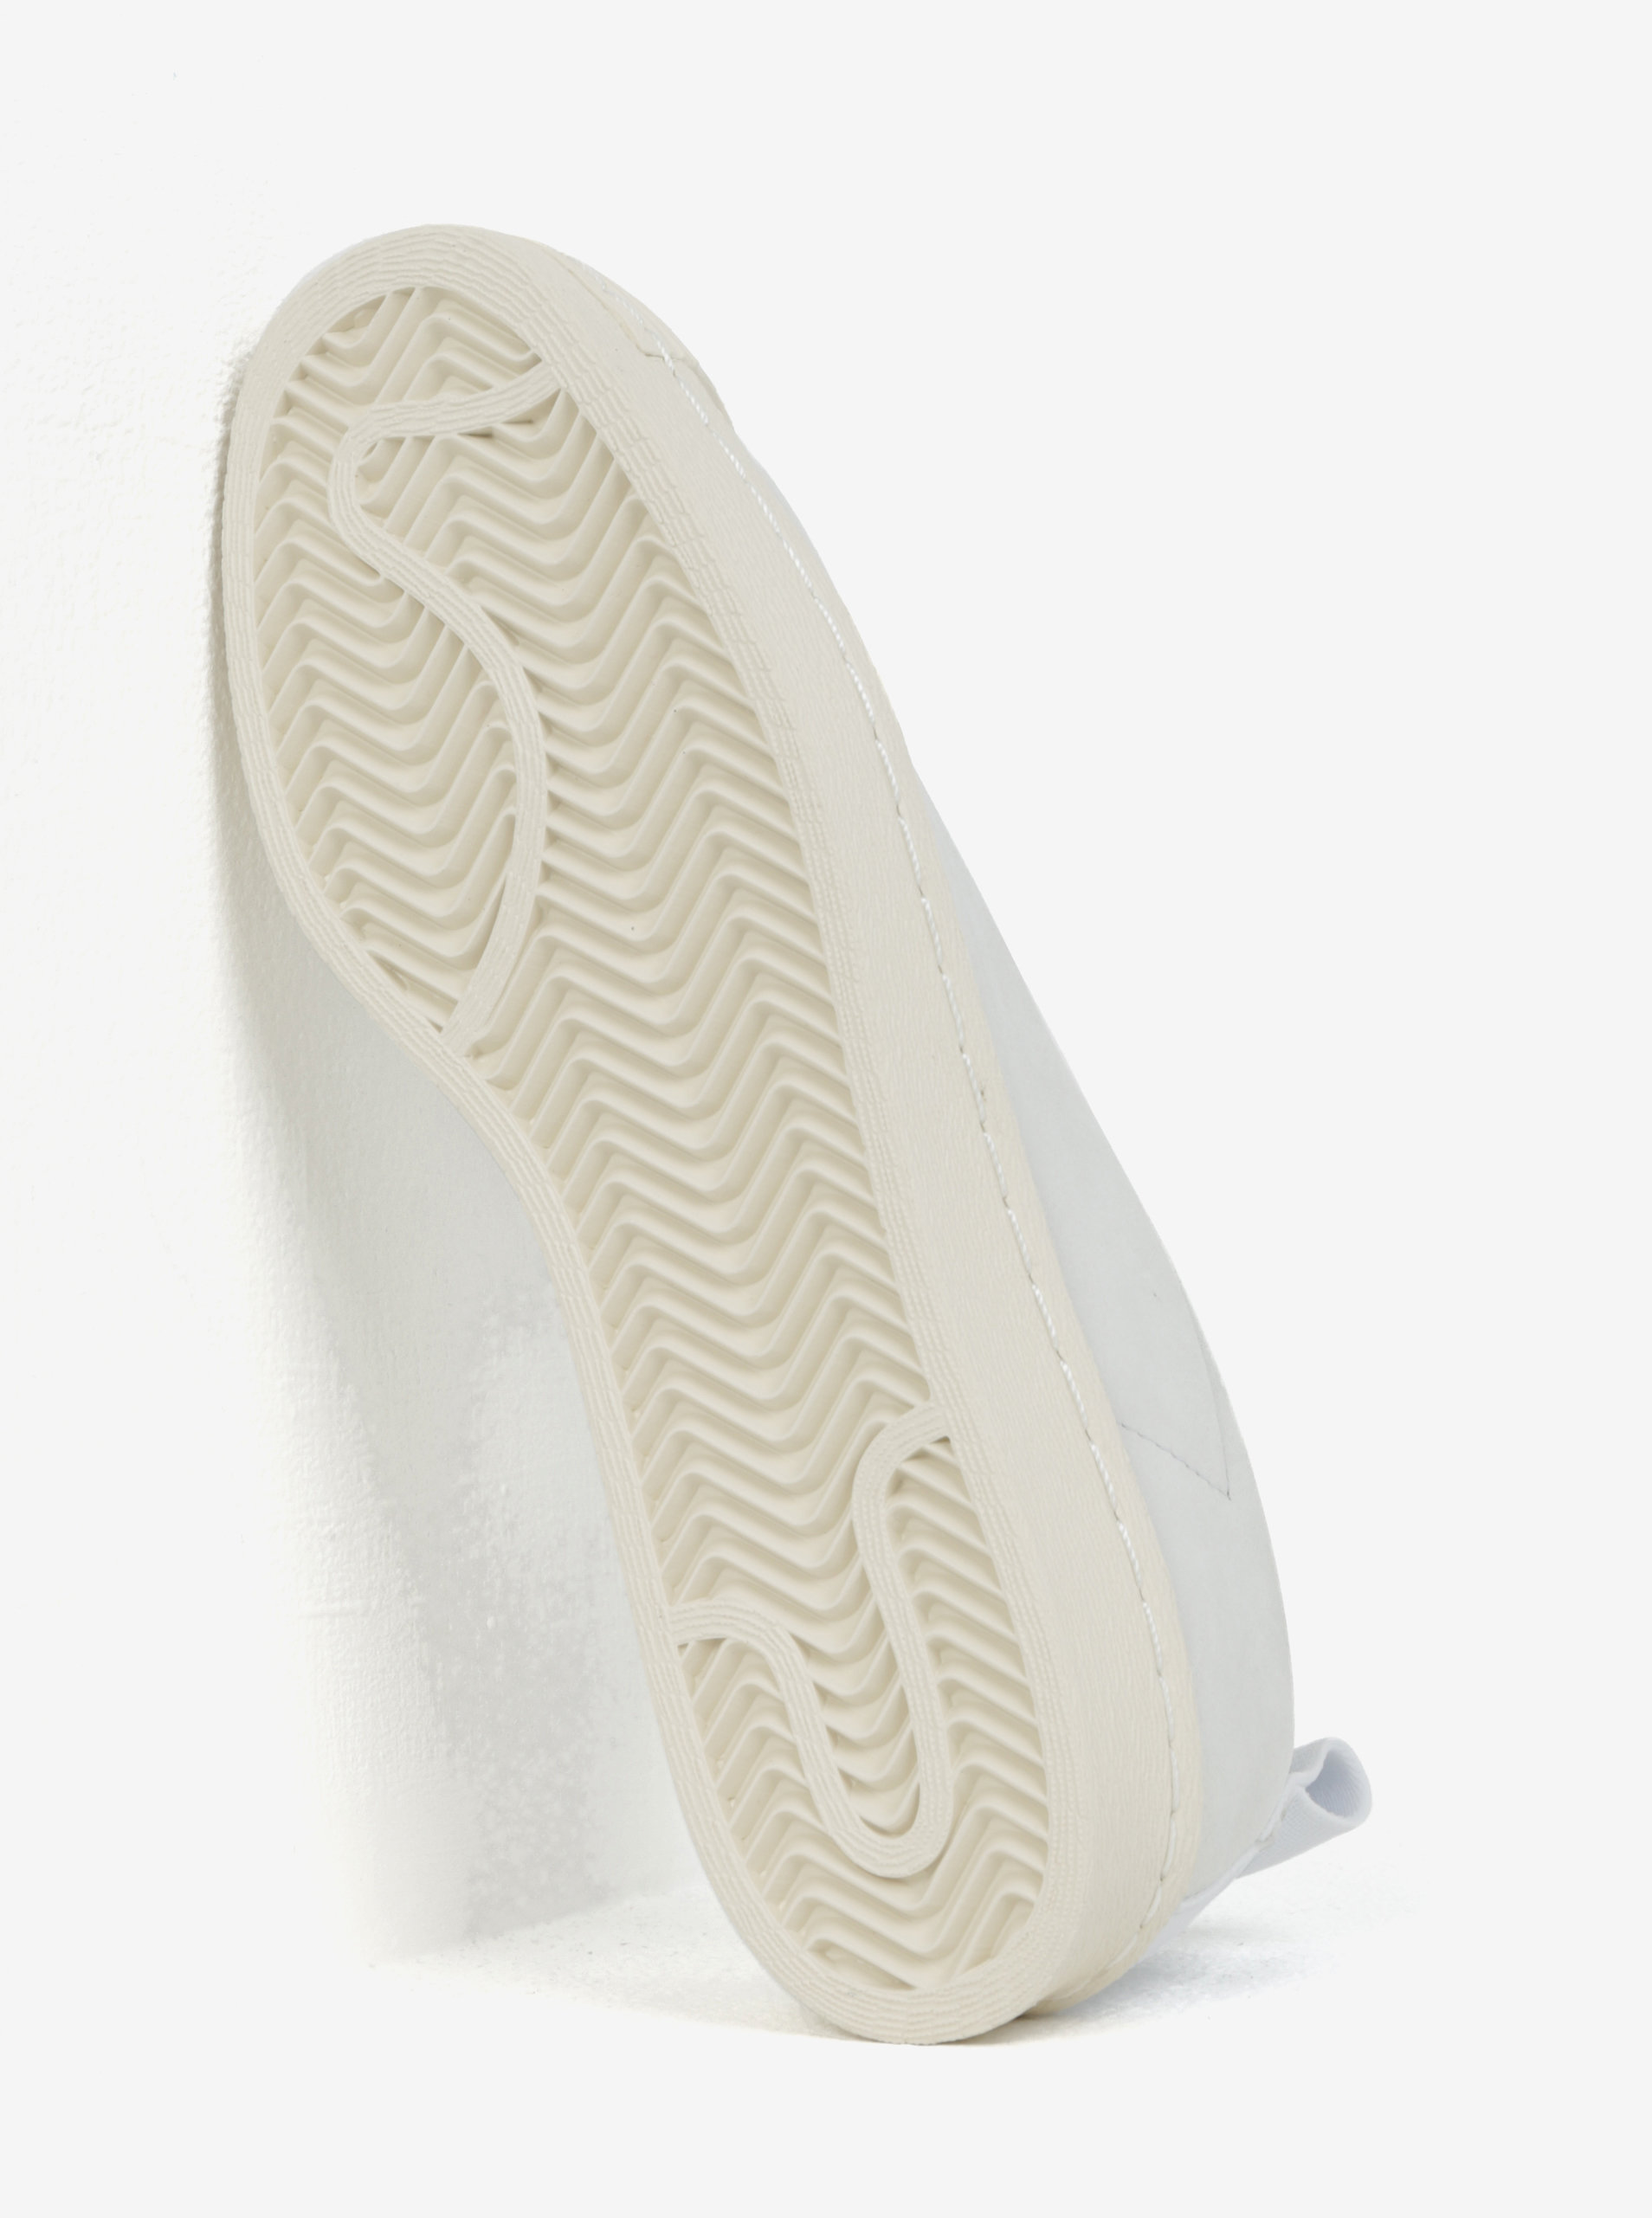 Biele dámske kožené slip on adidas Originals Tubular Superstar ... b276f97798d